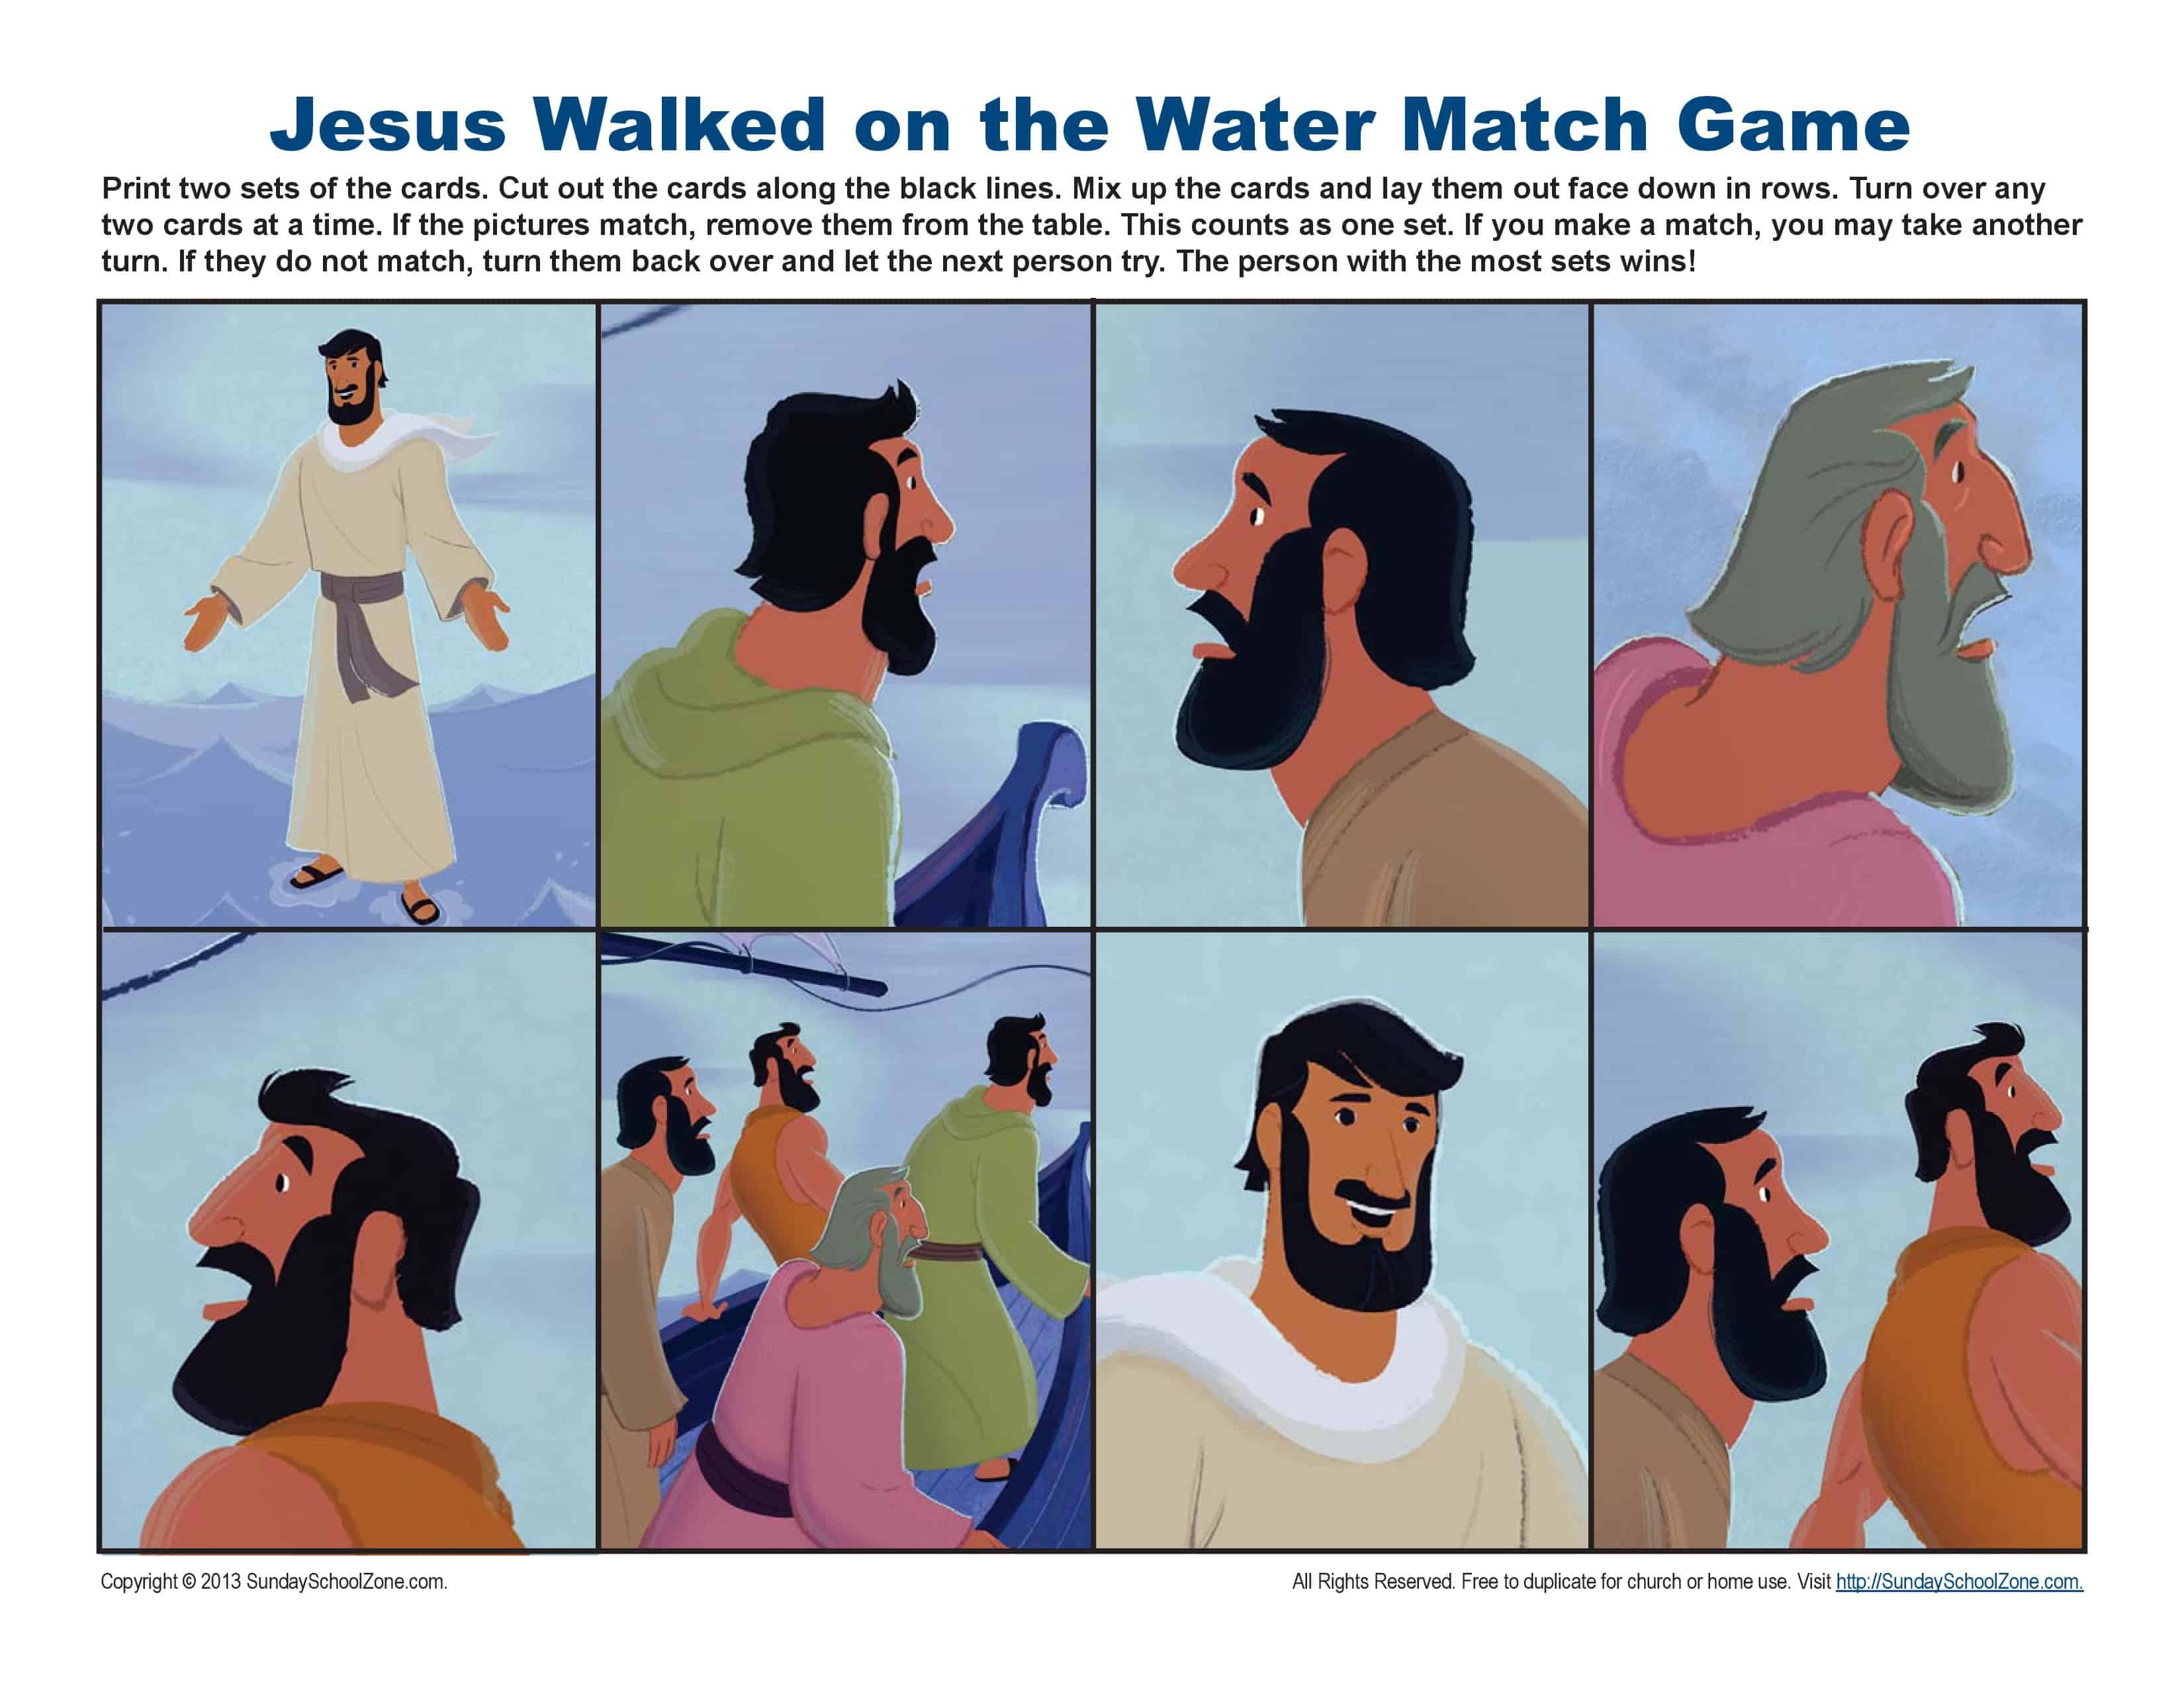 Jesus Walks on Water Match Game Bible Activities for